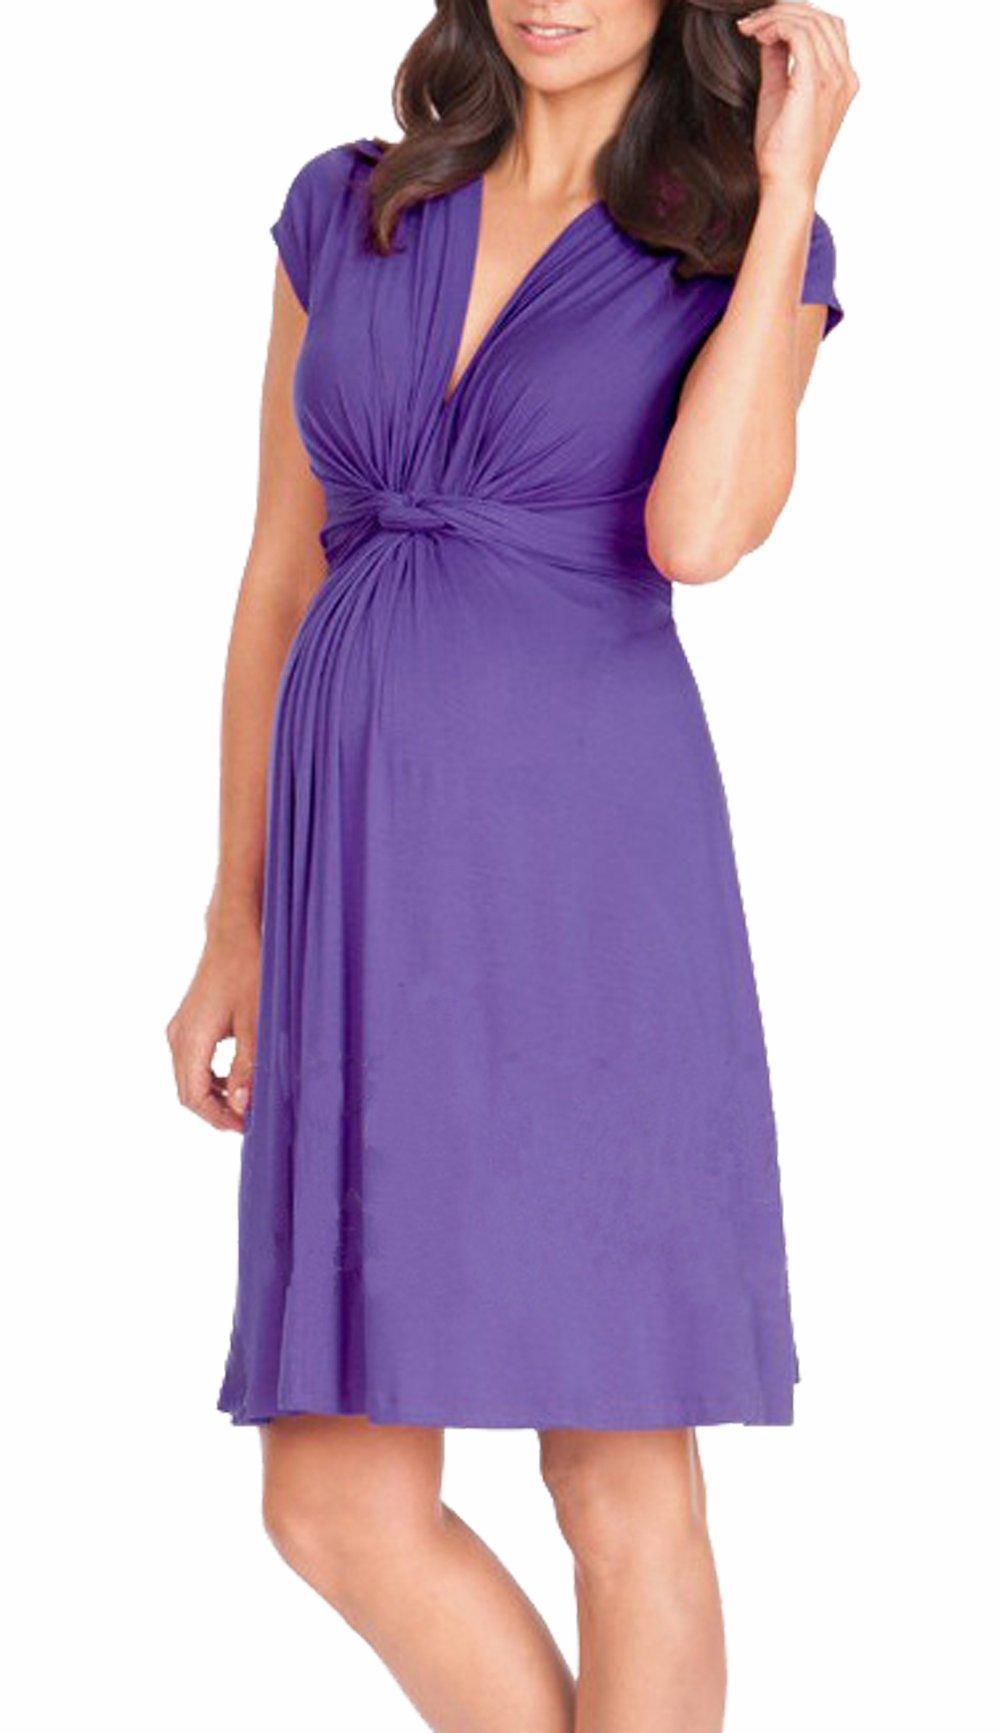 Unilove Women's Maternity Nursing Dress (S, Purple)